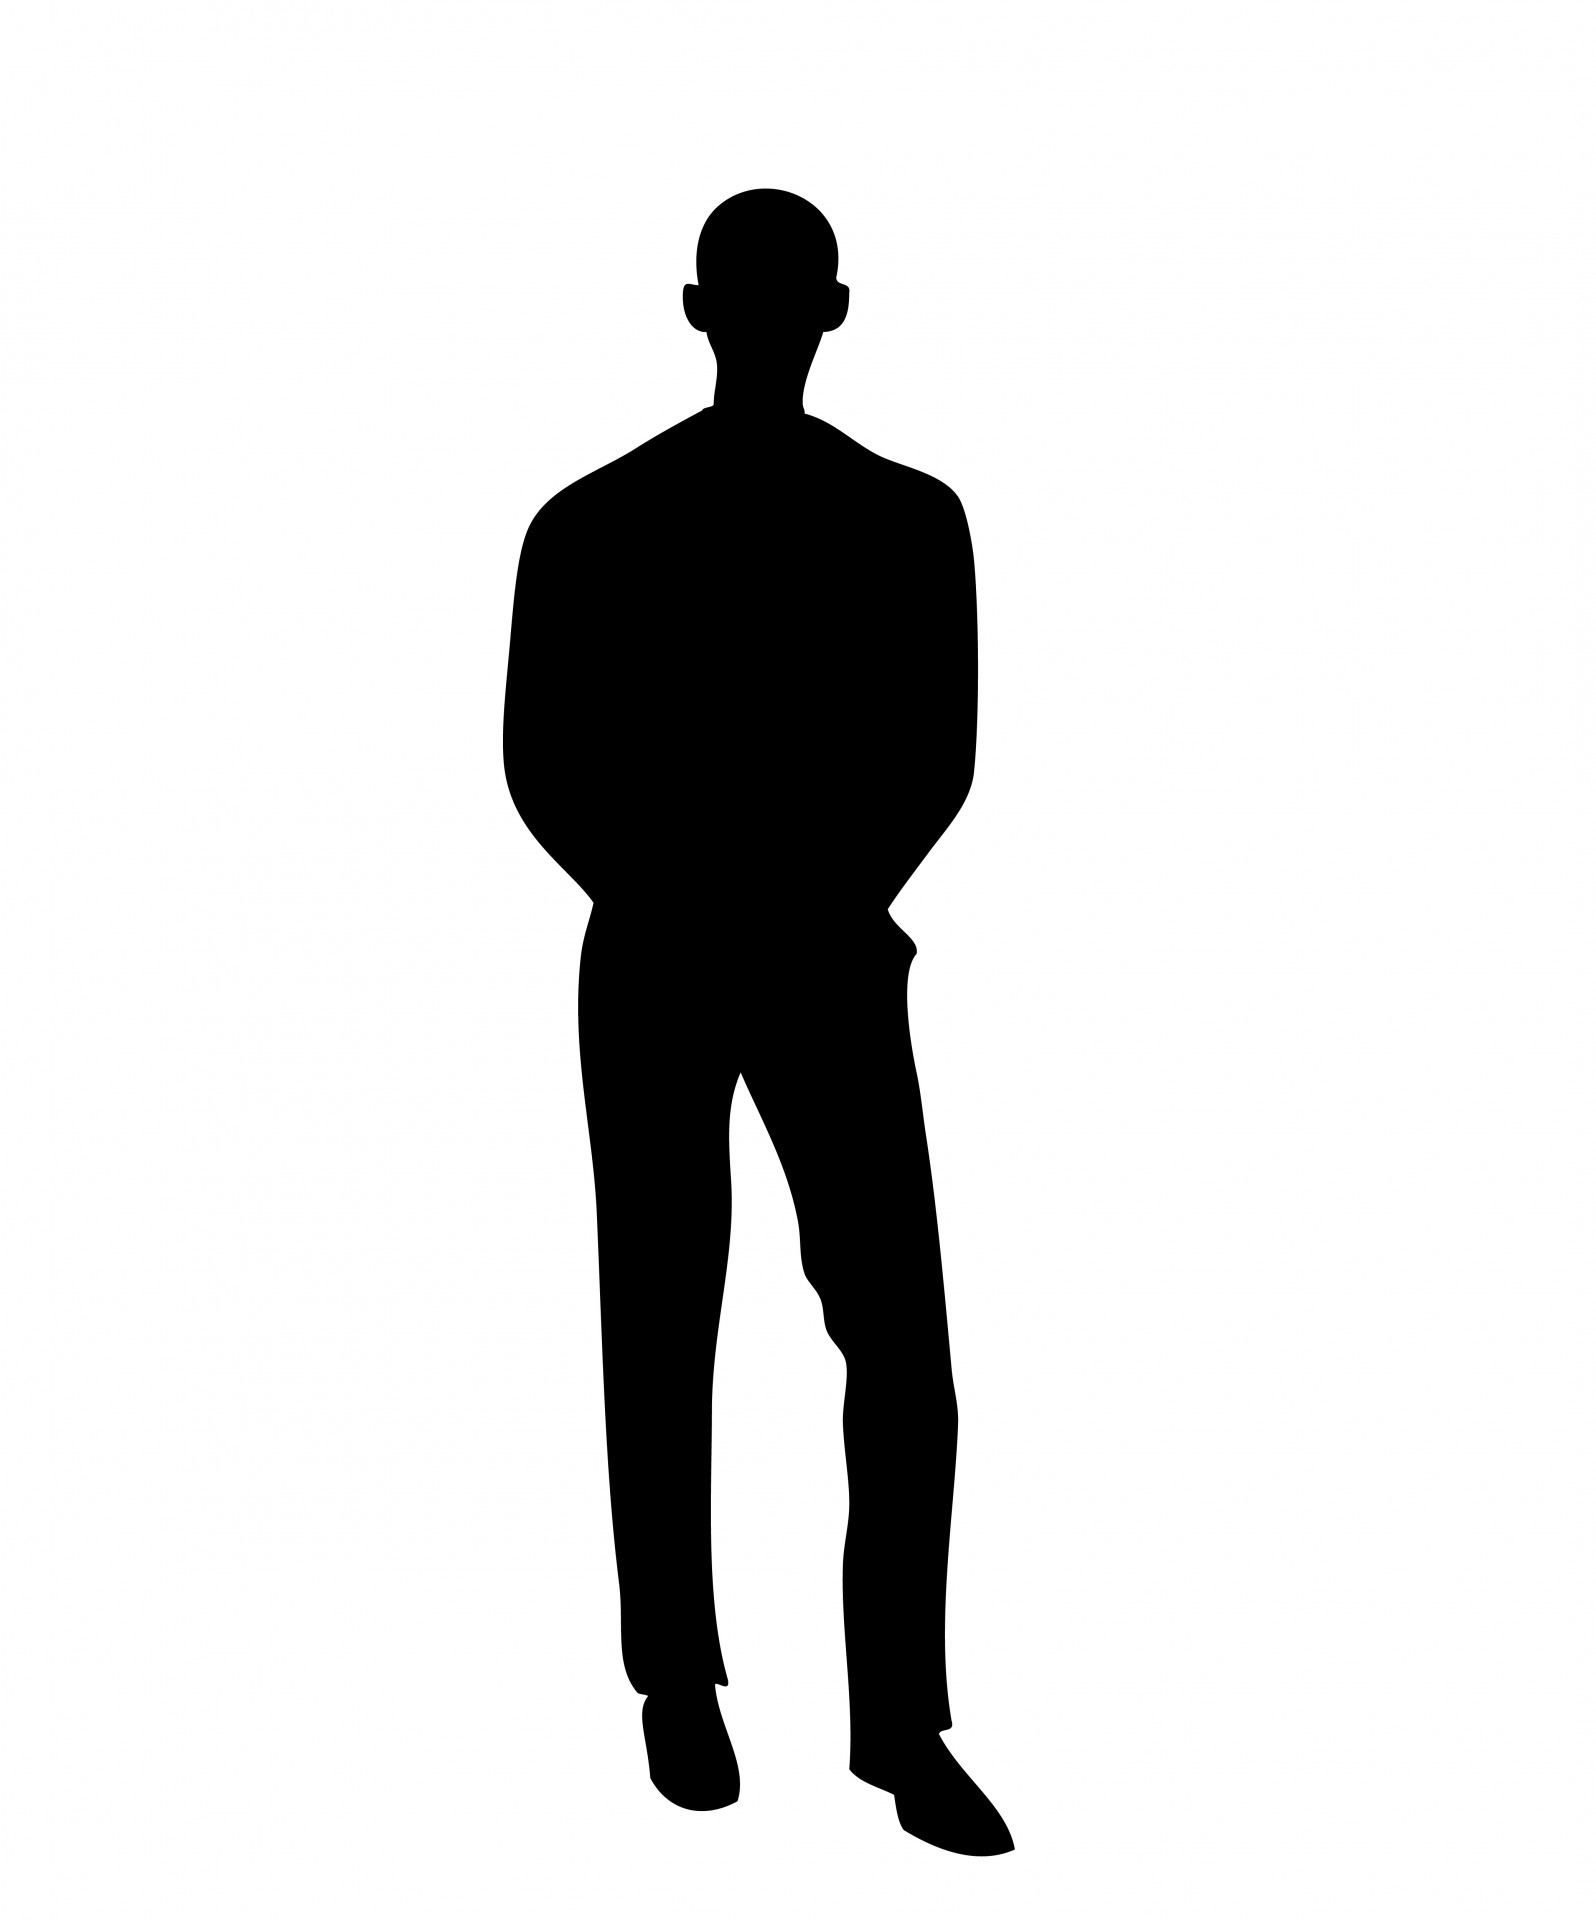 1596x1920 Man In Black Silhouette Free Stock Photo